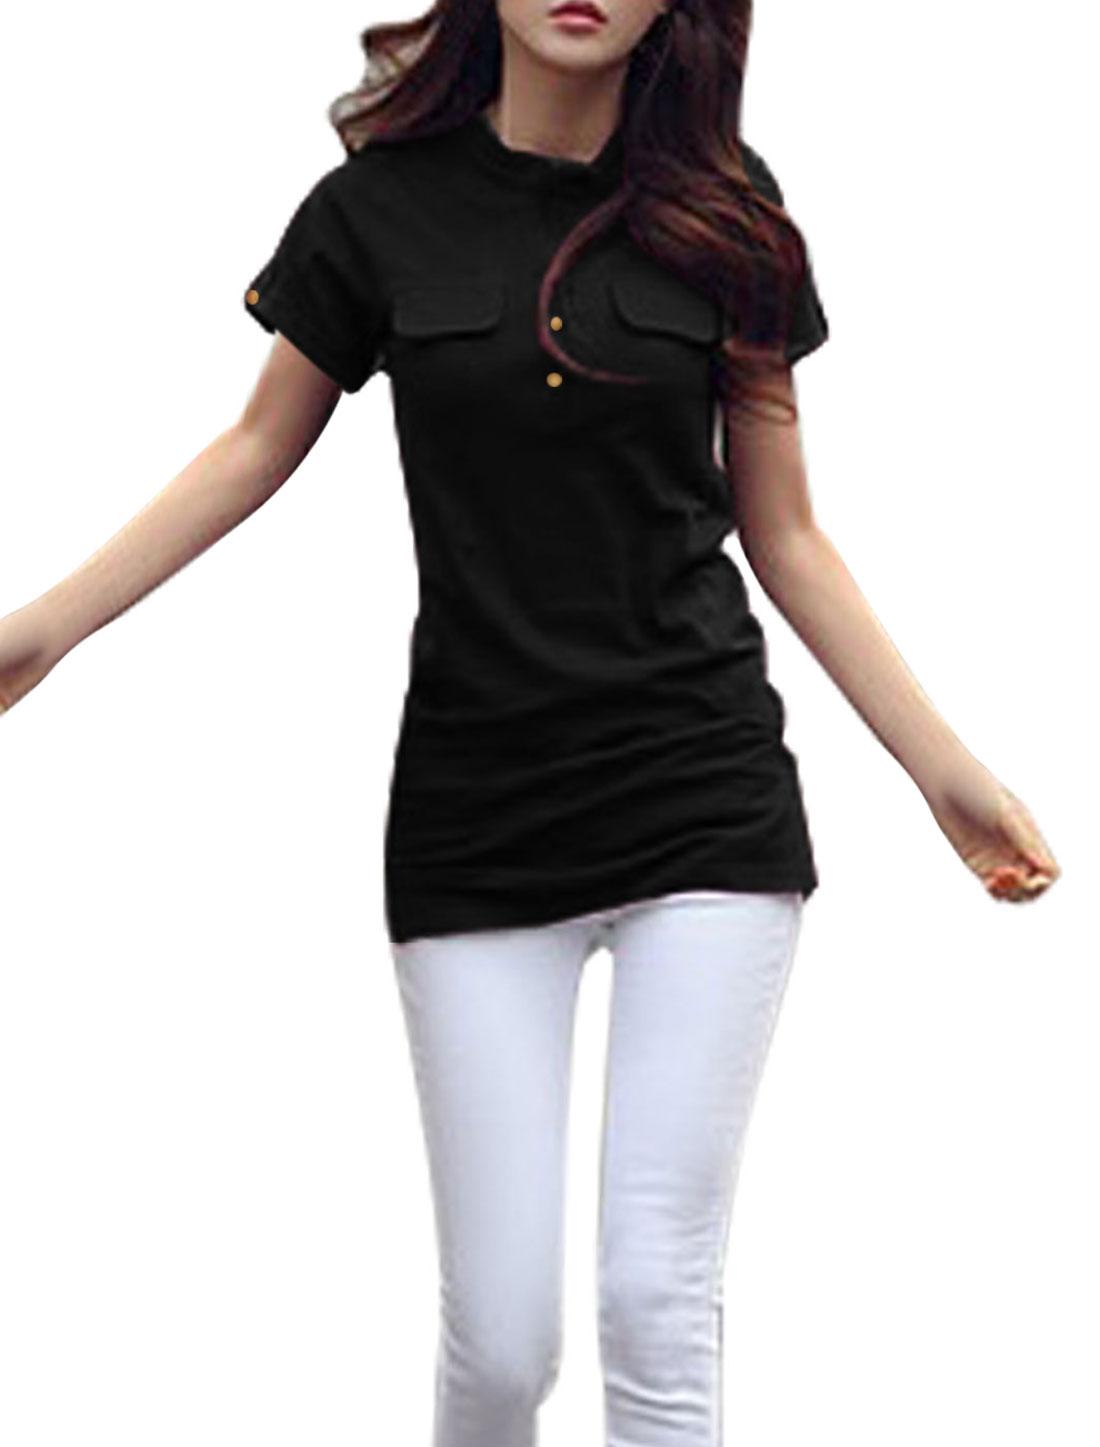 Women Mock Pockets Front 1/4 Placket Fashion Tunic Top Black S